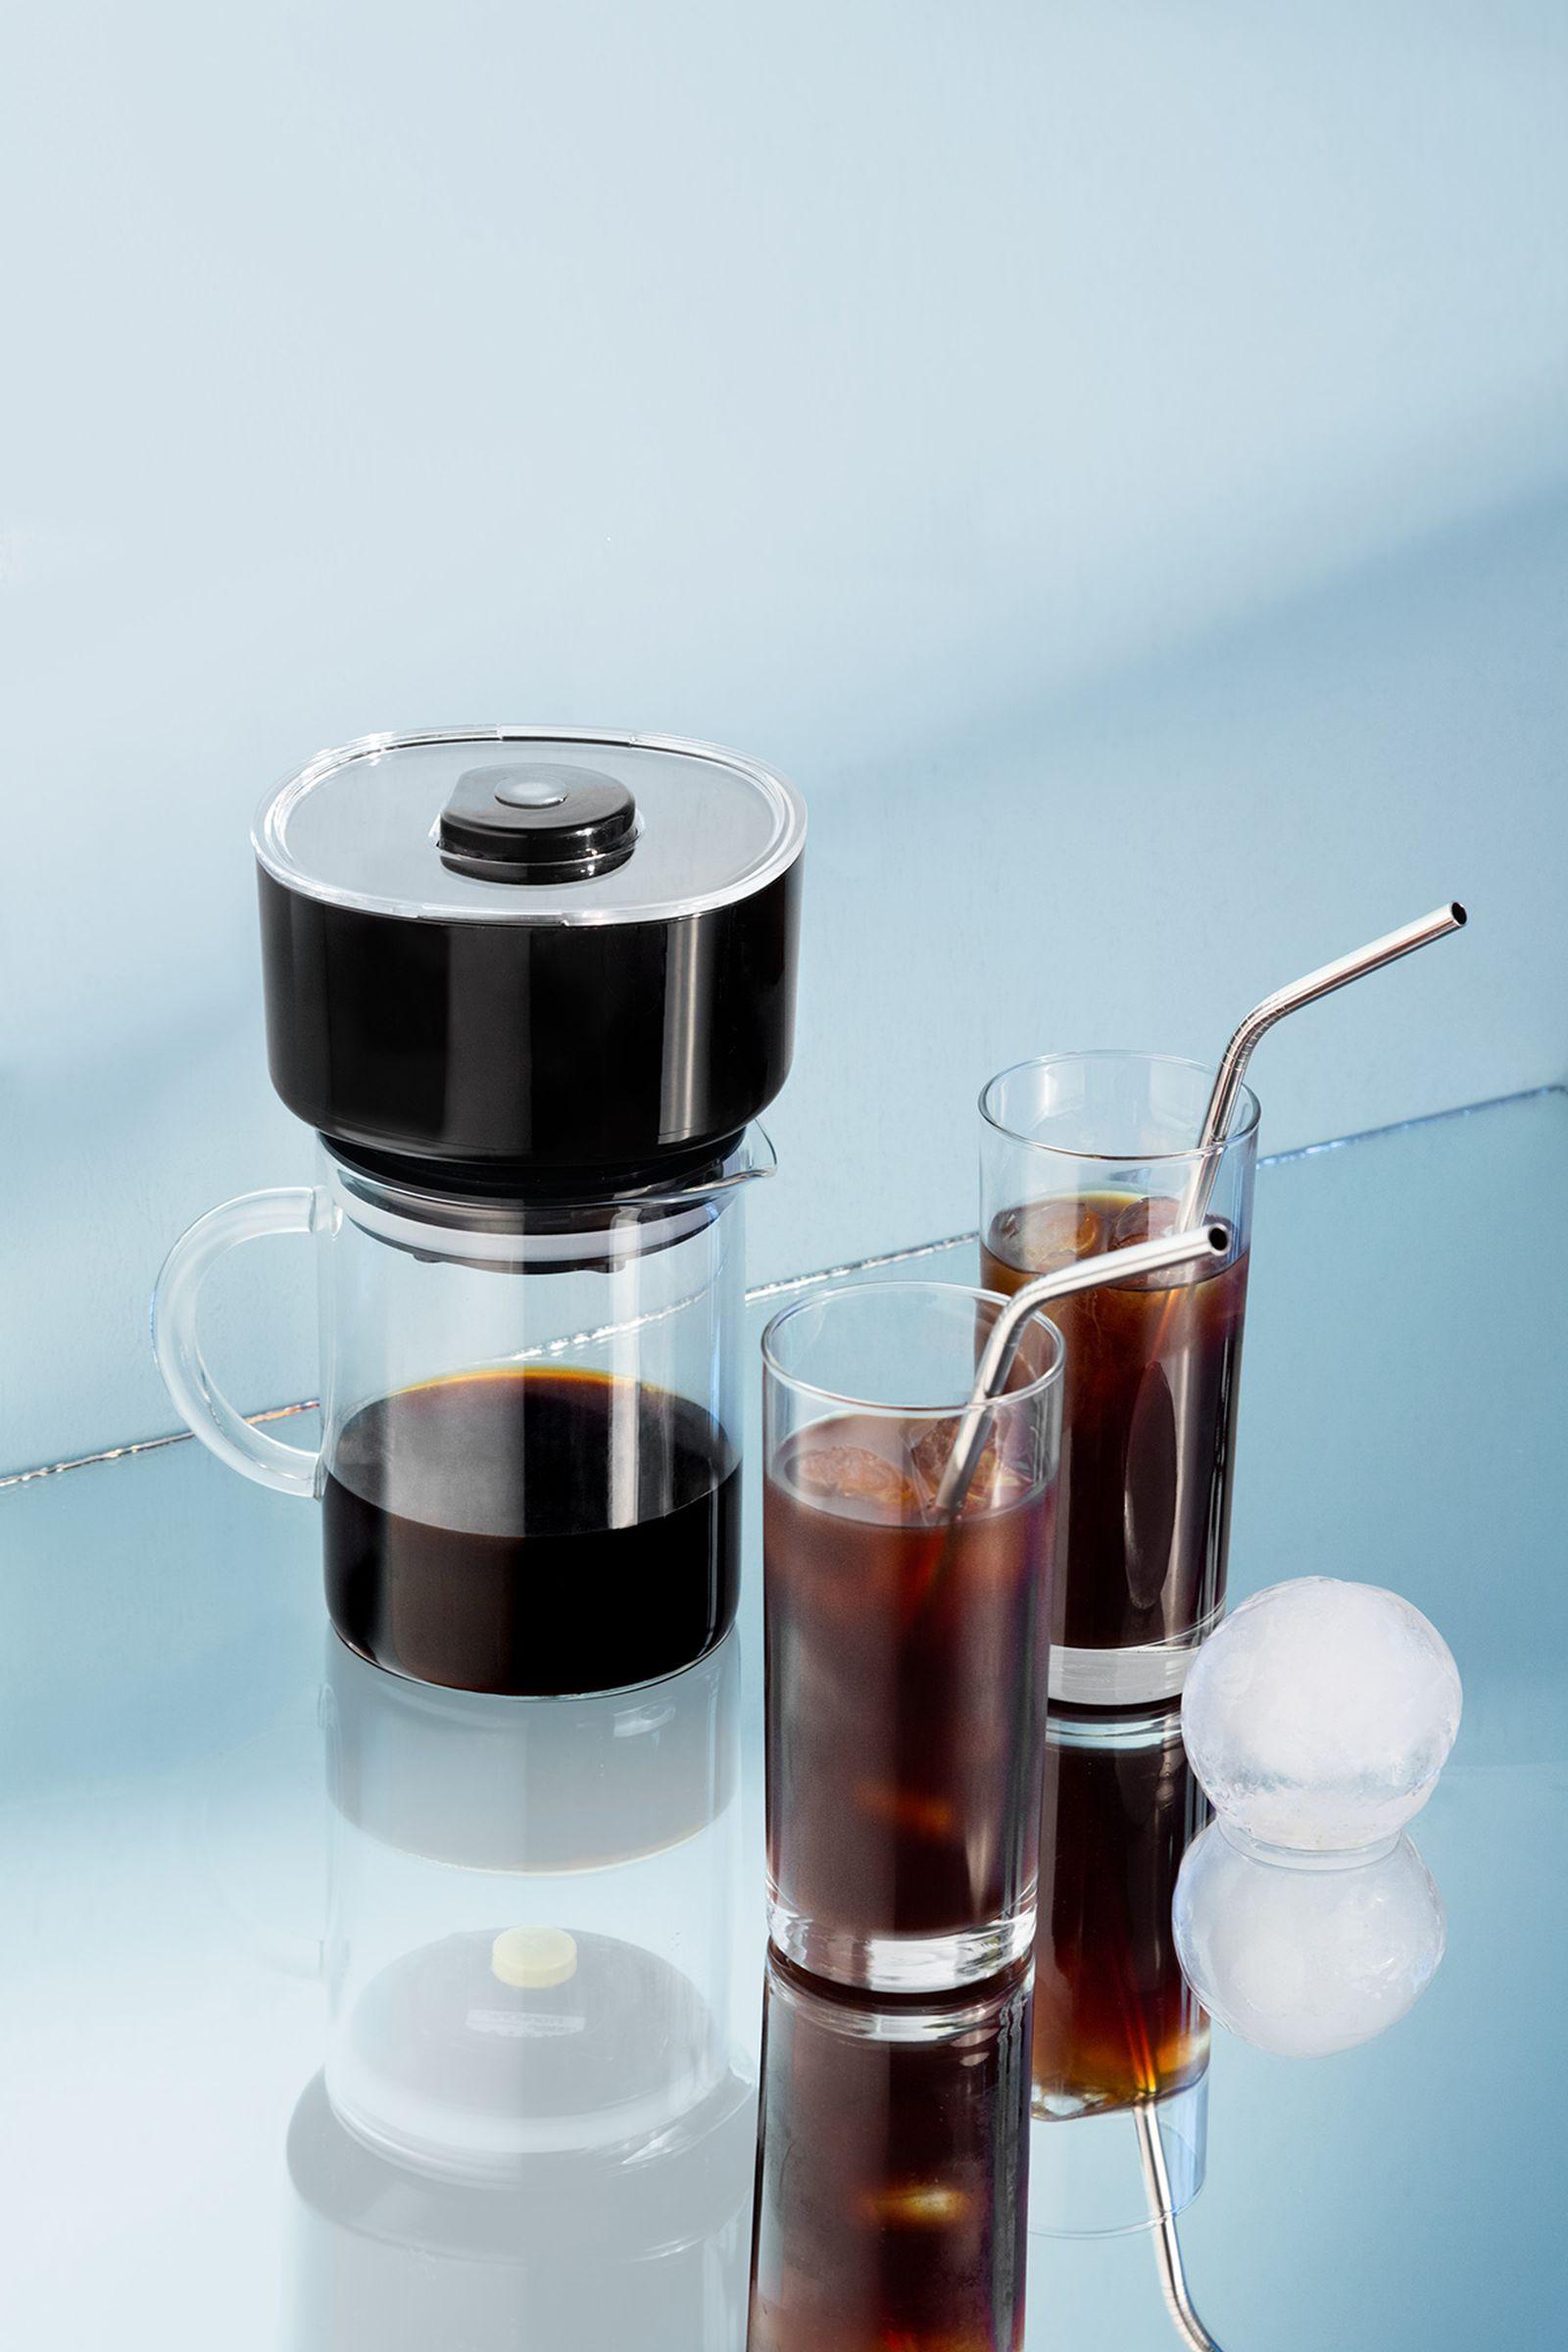 FrankOne Coffee Maker